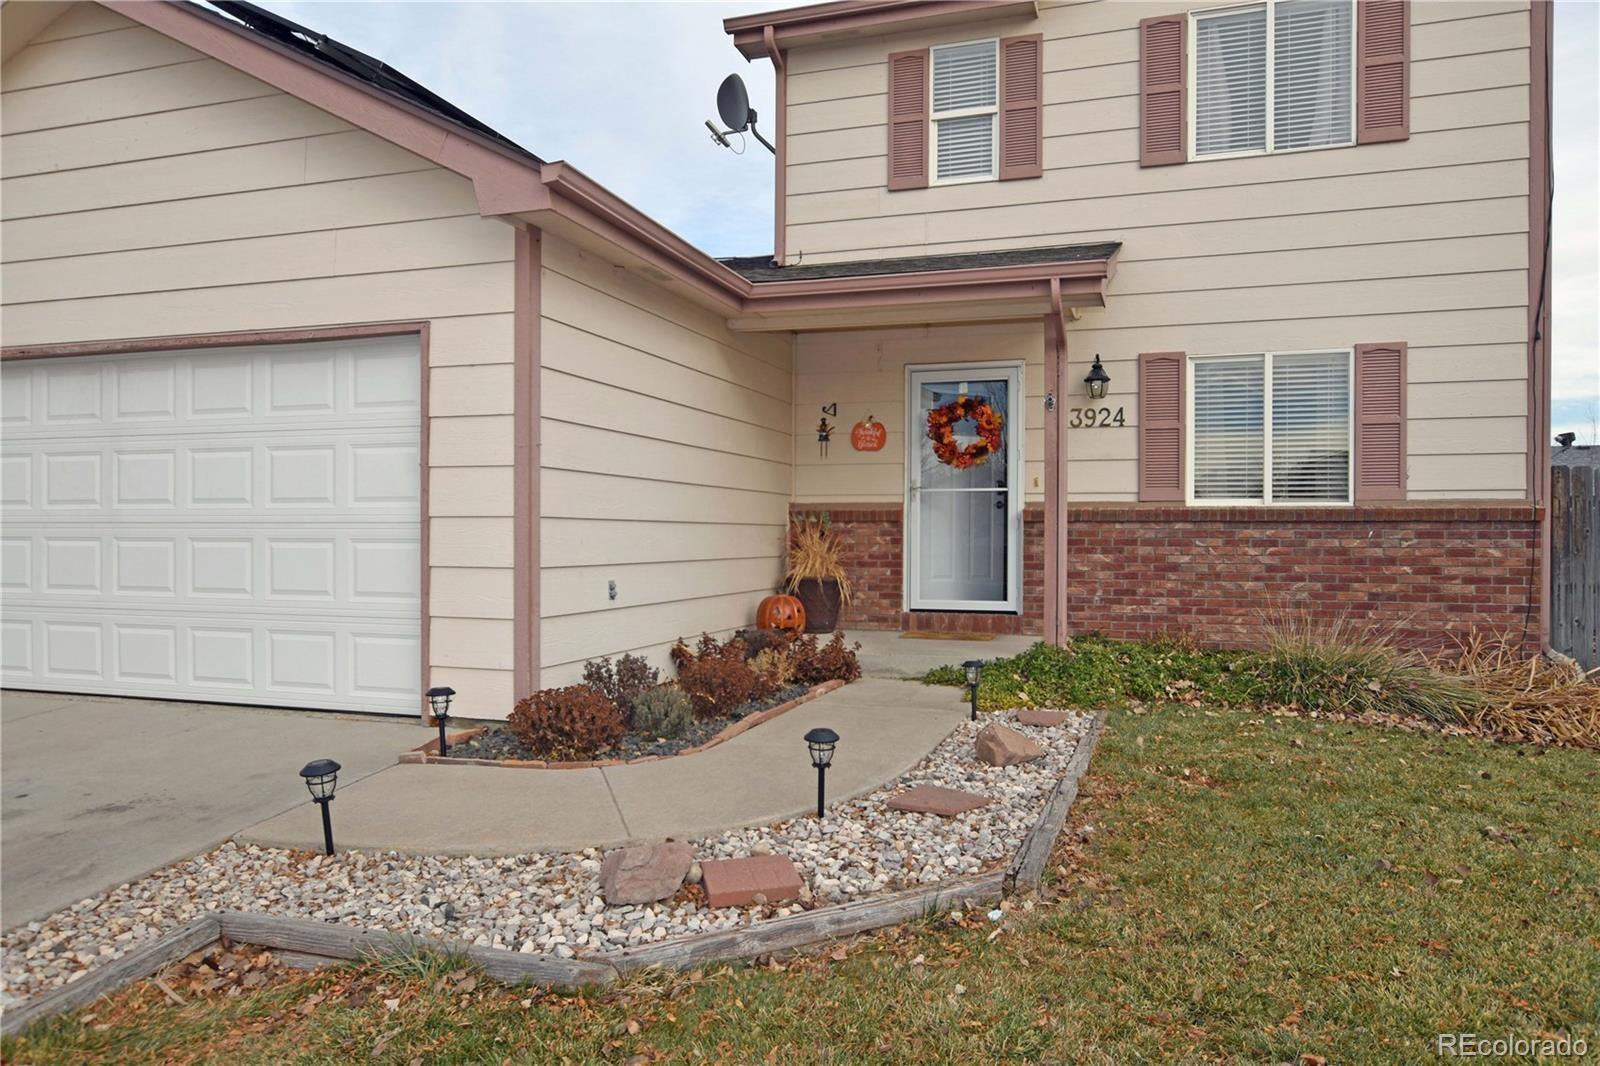 MLS# 9206879 - 4 - 3924 Eagles Nest Drive, Evans, CO 80620